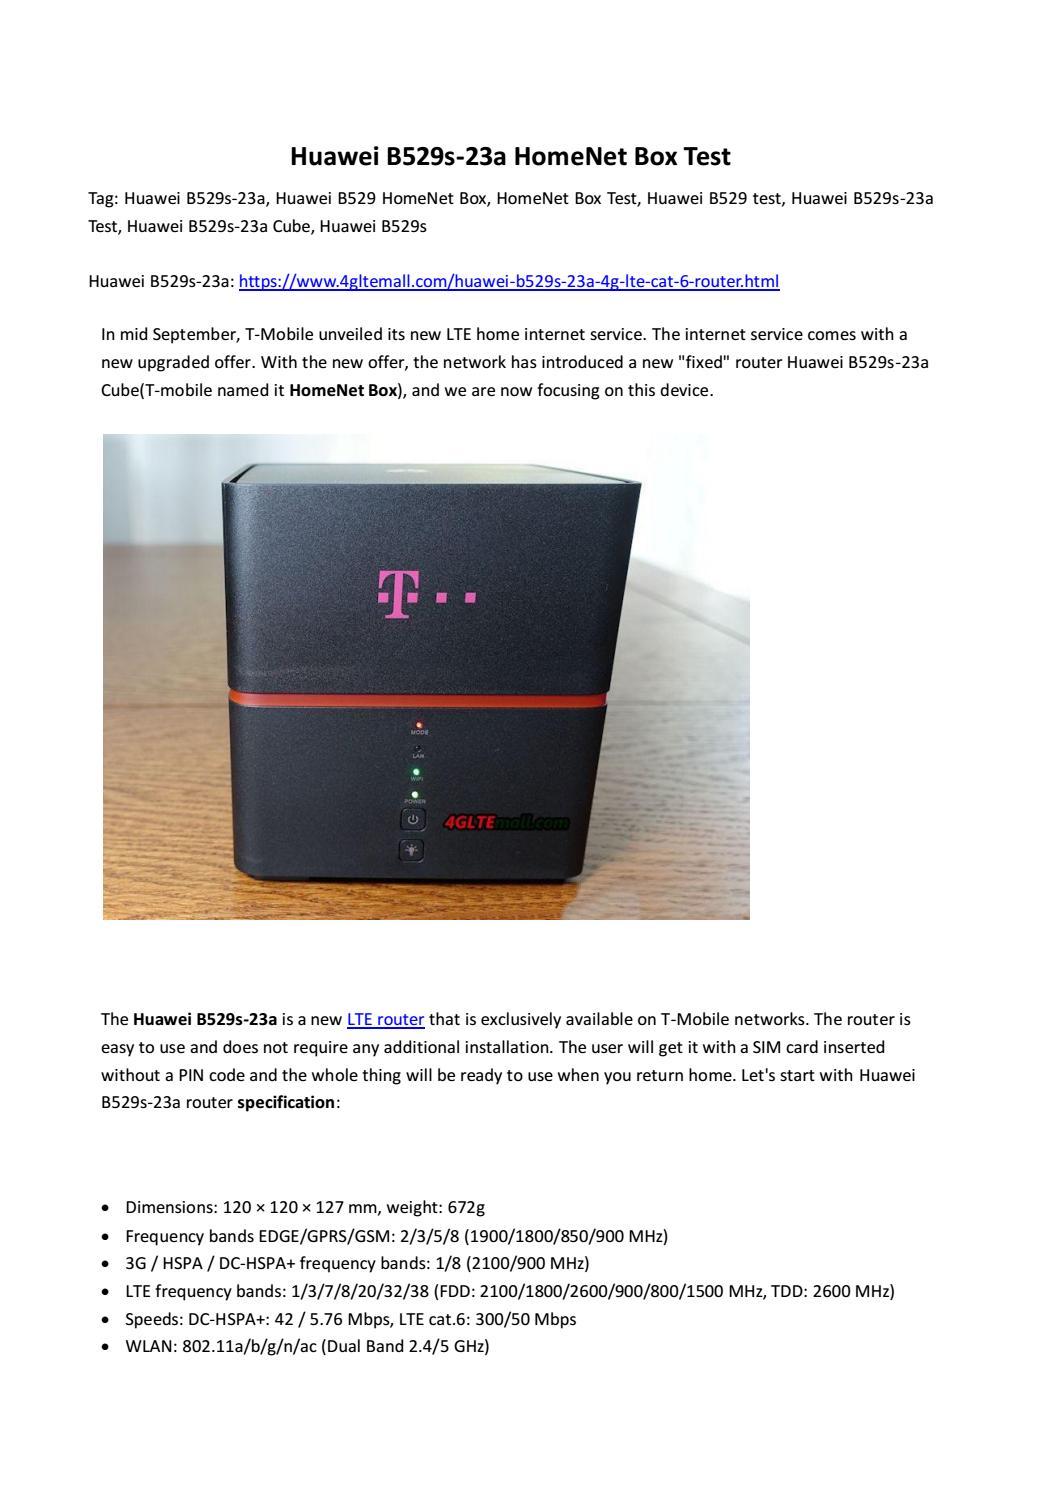 Huawei B529s-23a HomeNet Box Test by Lte Mall - issuu